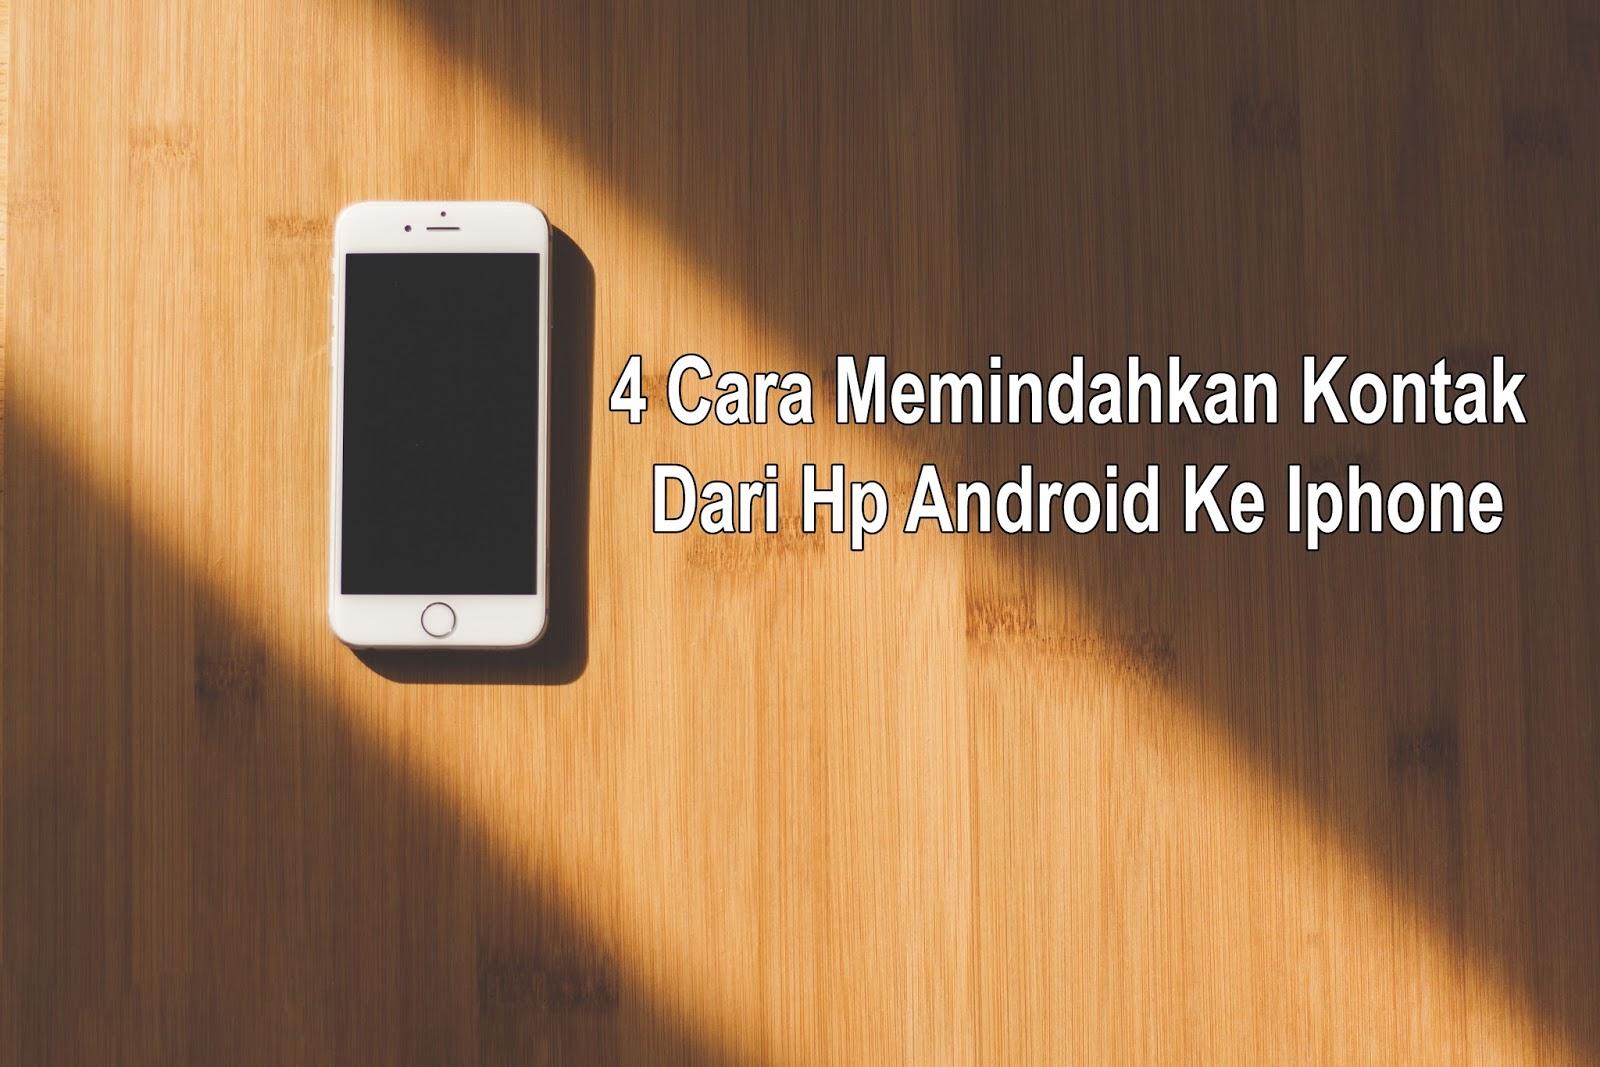 hp android ke iphone